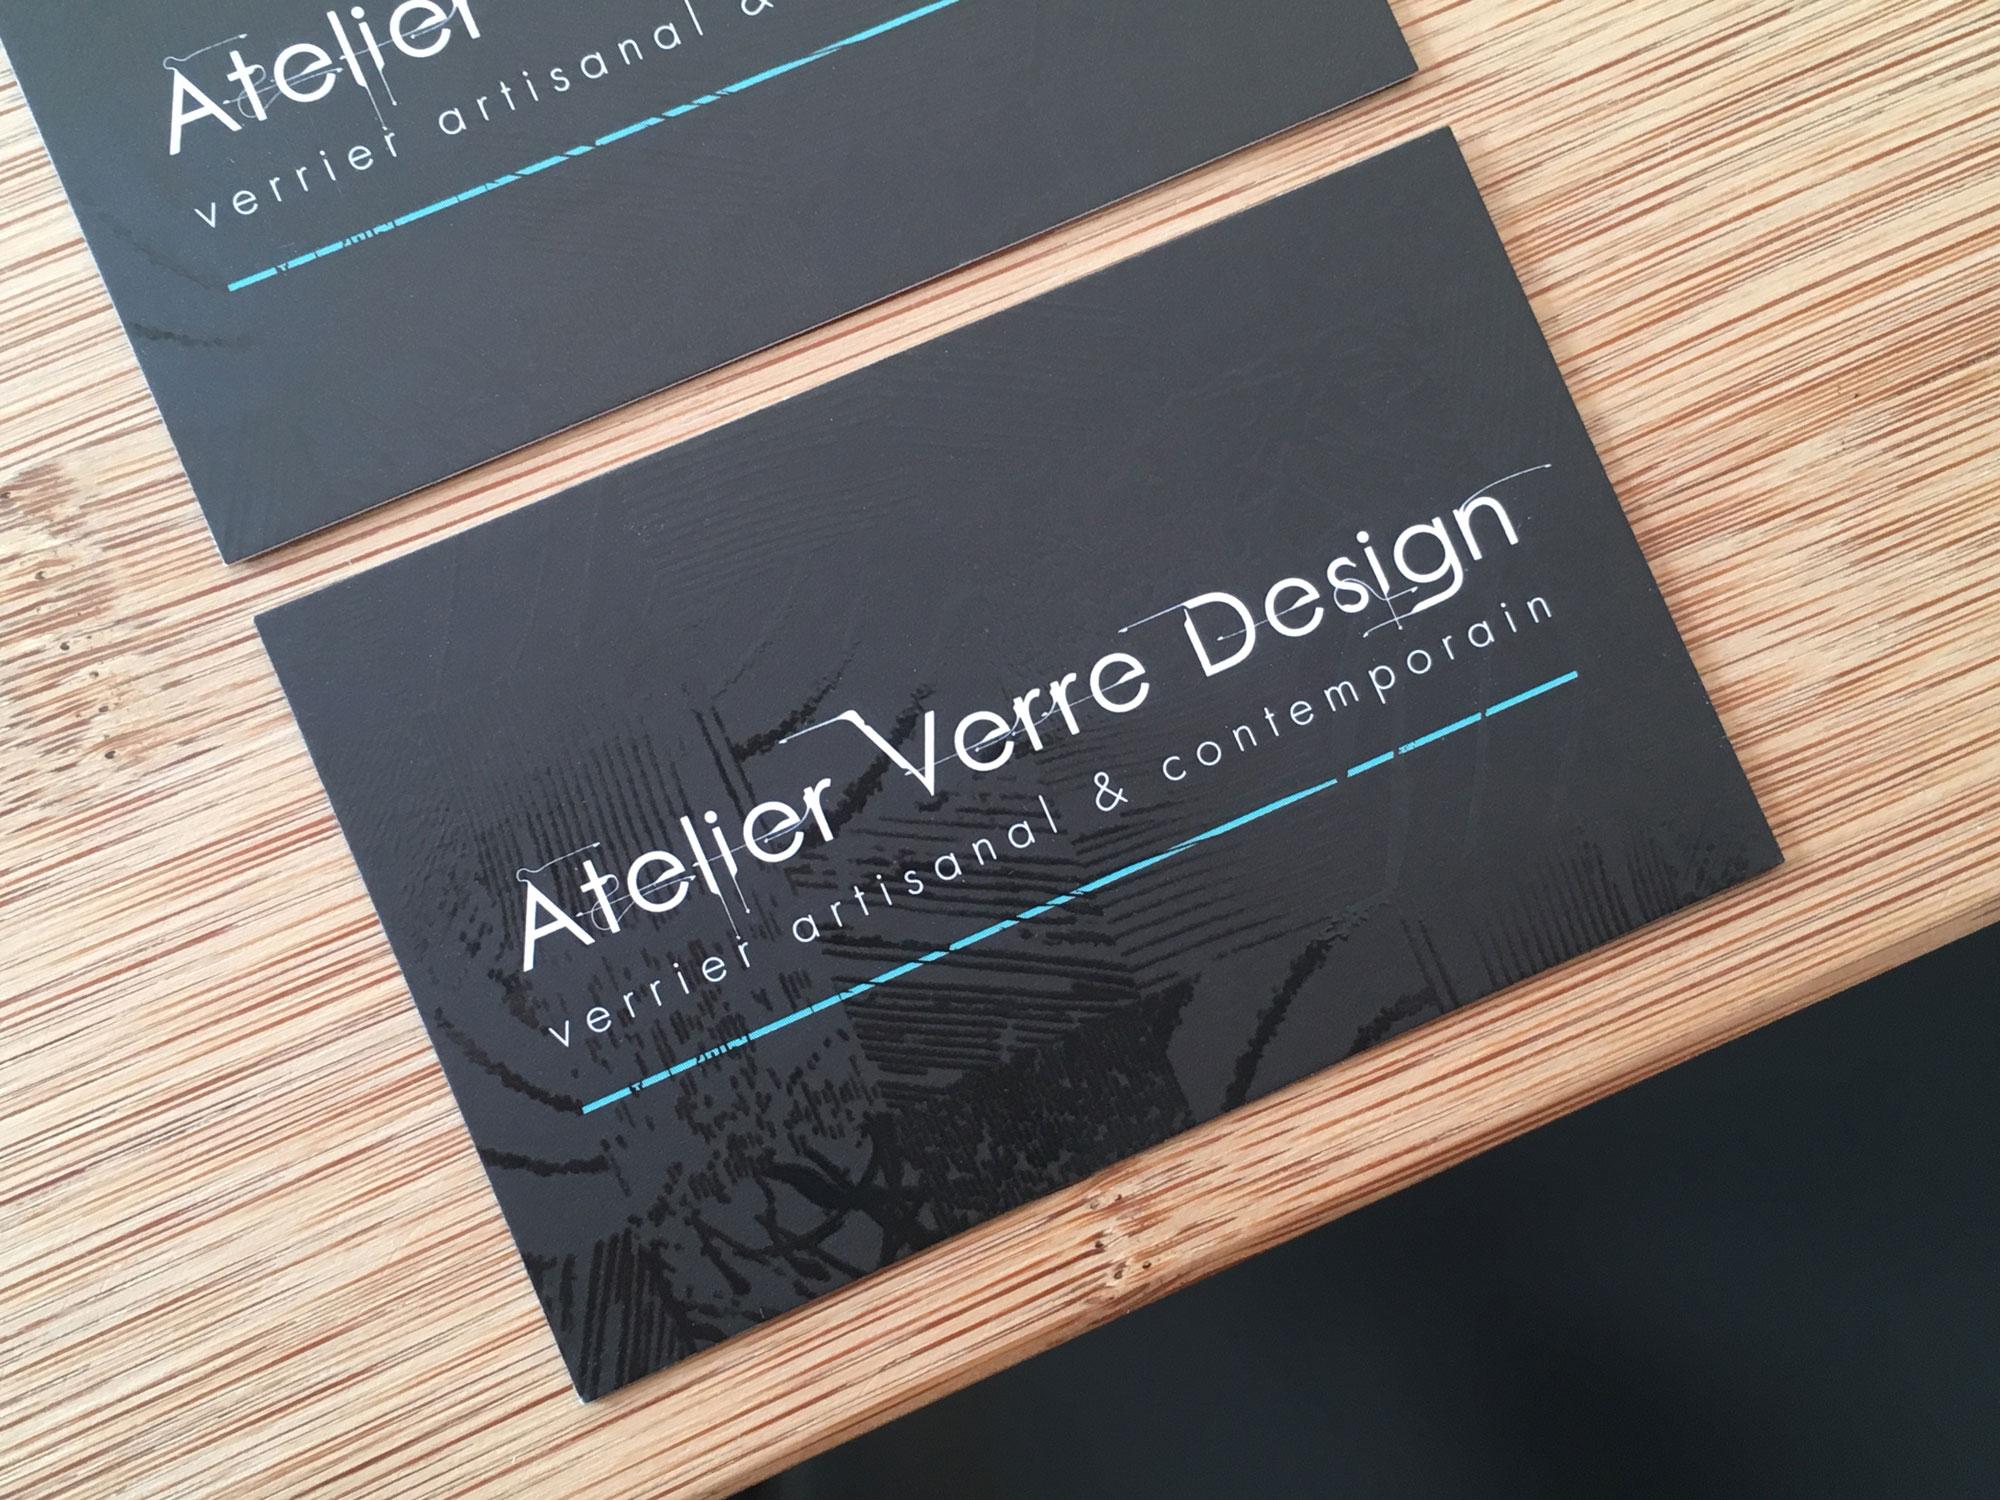 ATELIER VERRE DESIGN Verrier Artisanal Contemporain